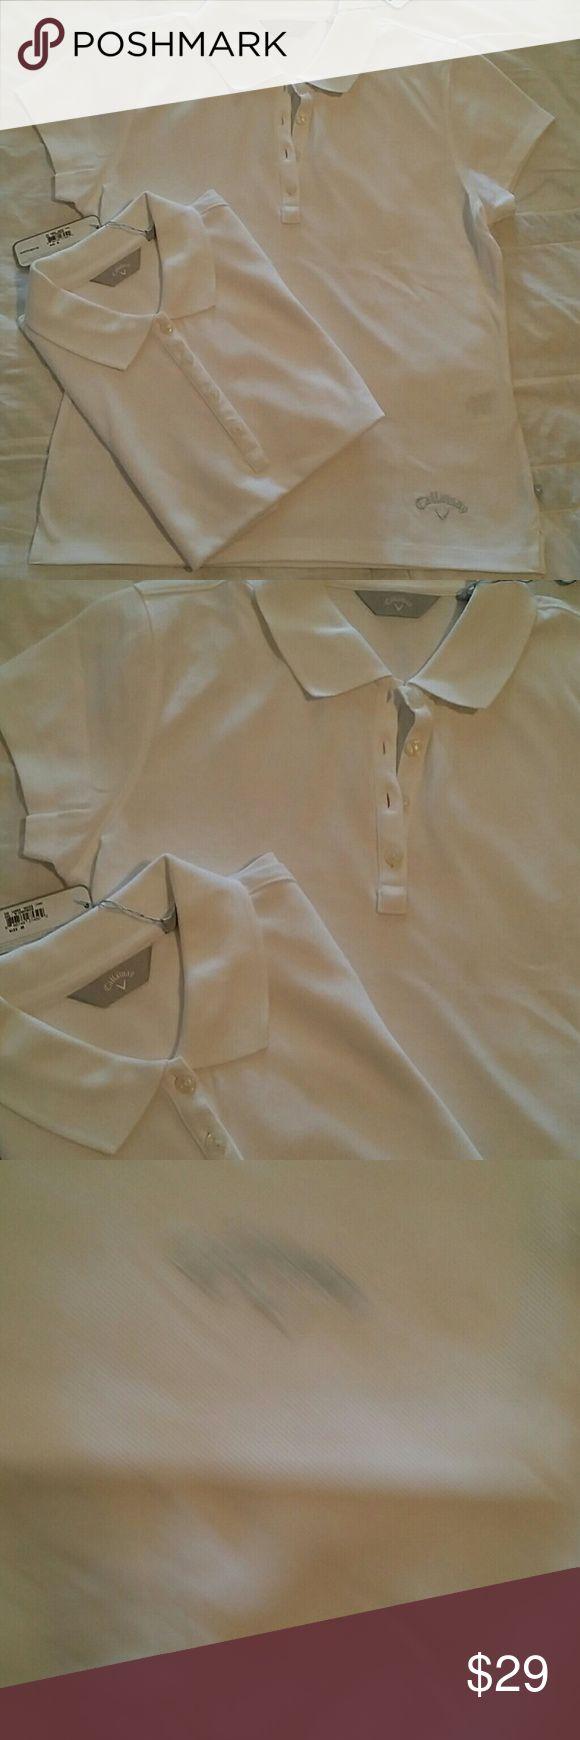 2 CALLAWAY WOMENS GOLF SHIRTS NWT SZ M Here r 2 brand new golf shirts, sz medium.  Crisp white with silver embroidered logo. 4 button neckline. Callaway Tops Tees - Short Sleeve